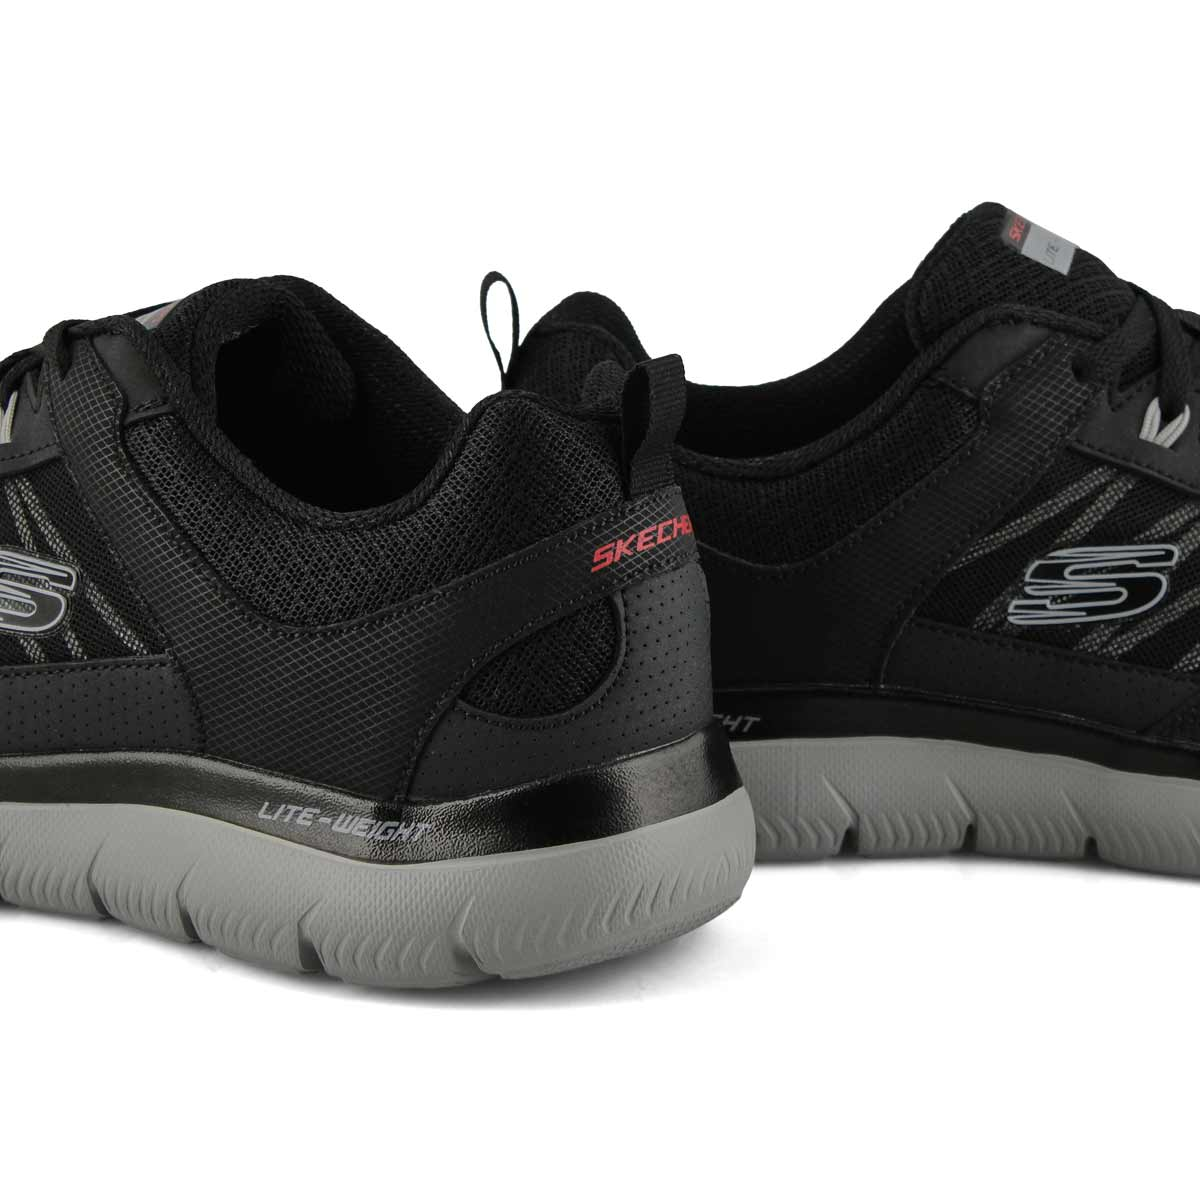 Men's Summits New World Sneakers Wide- Black/Grey